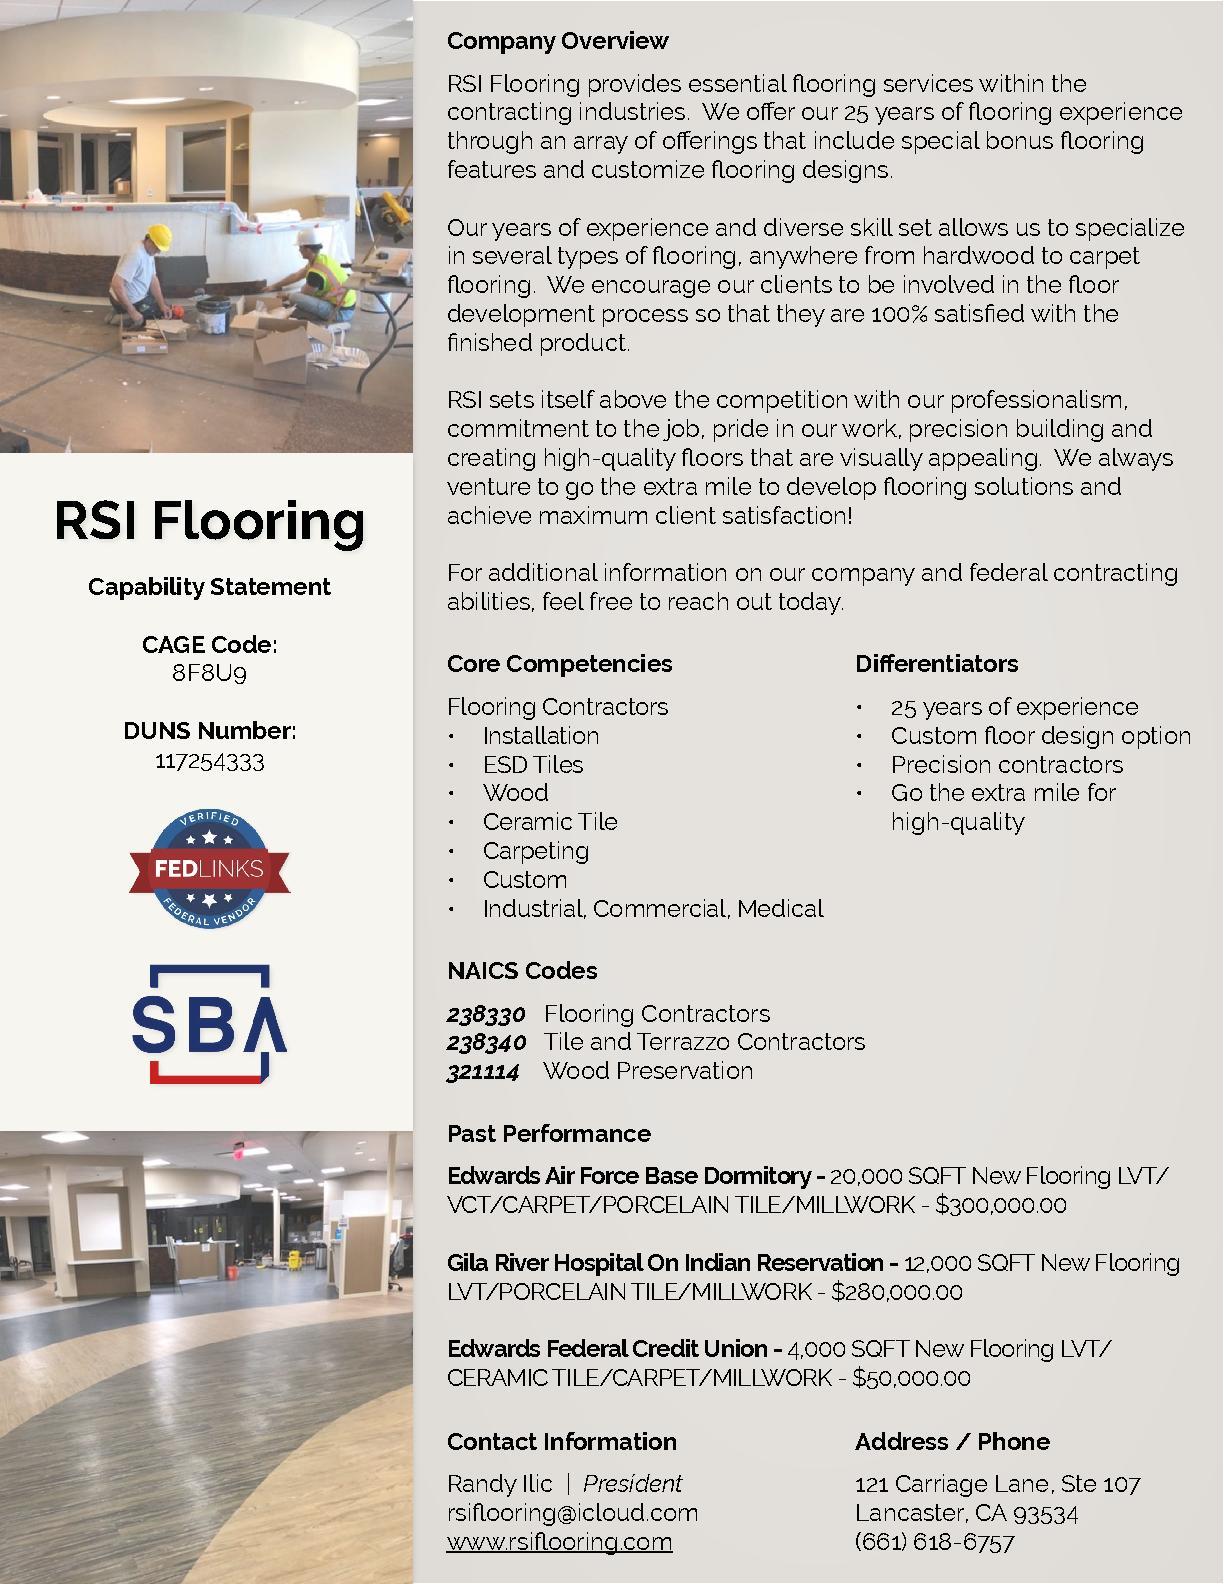 Rsi flooring capability statement